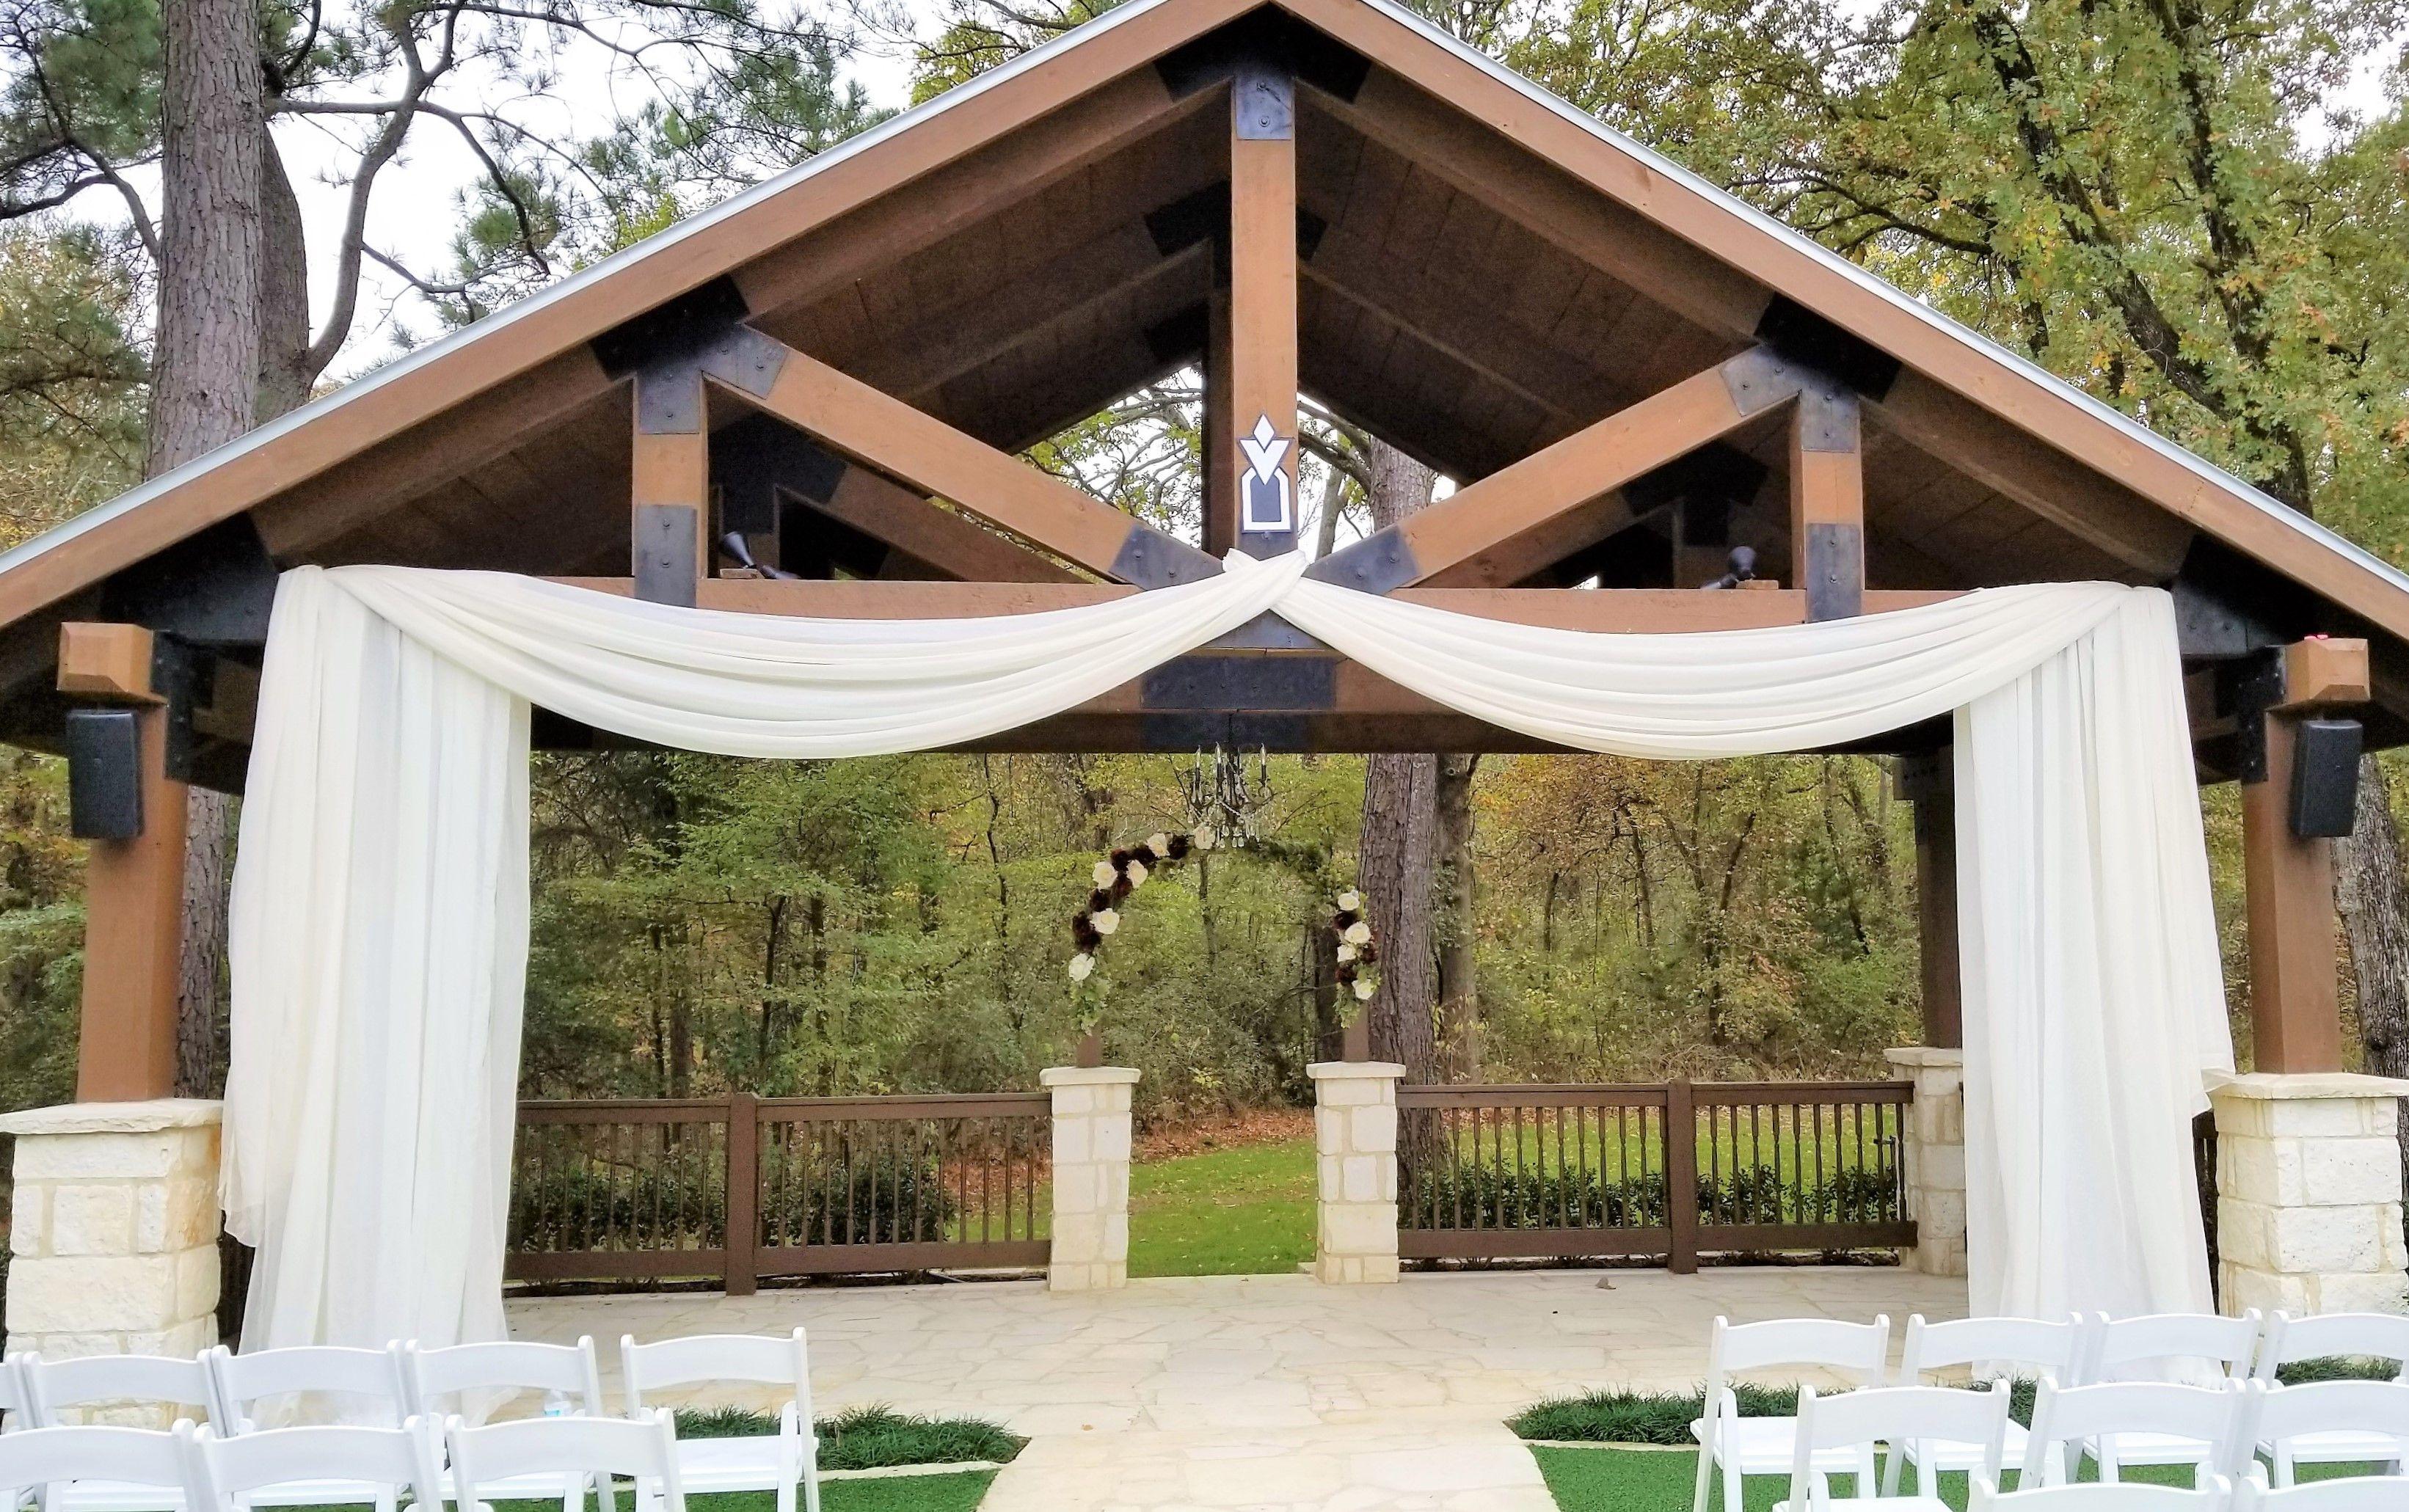 Gallery Taylor Rental Party Plus Outdoor Party Checklist Canopy Tent Outdoor Outdoor